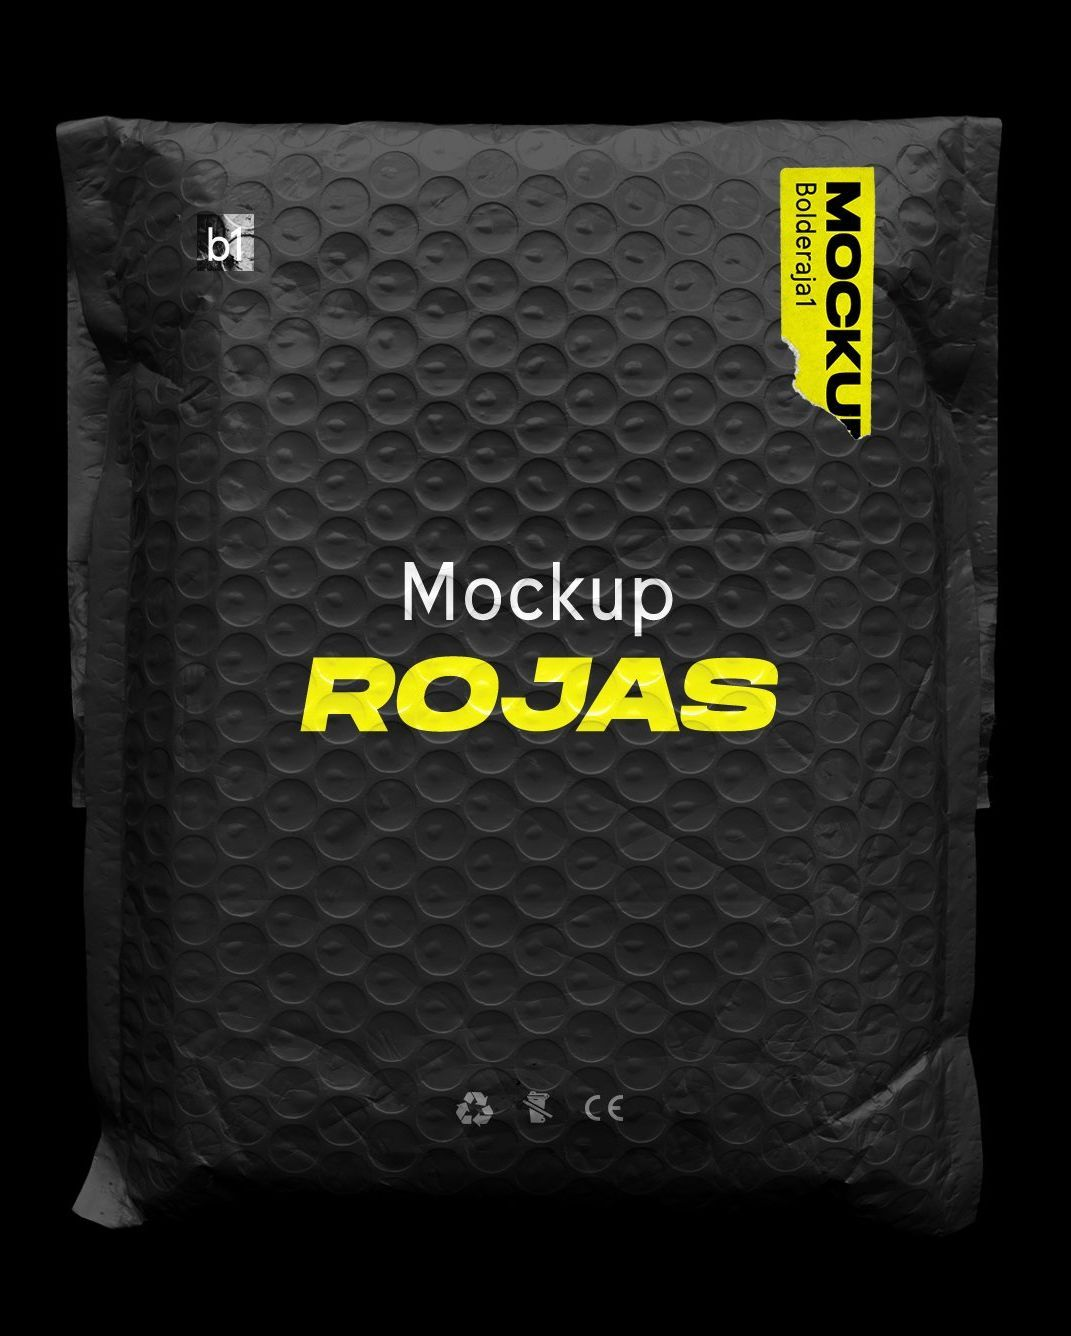 Download free graphic resources for mail bag mockup. Bubble Bag Postage Mockup Rojas Plastic Packaging Design Book Design Layout Graphic Design Mockup